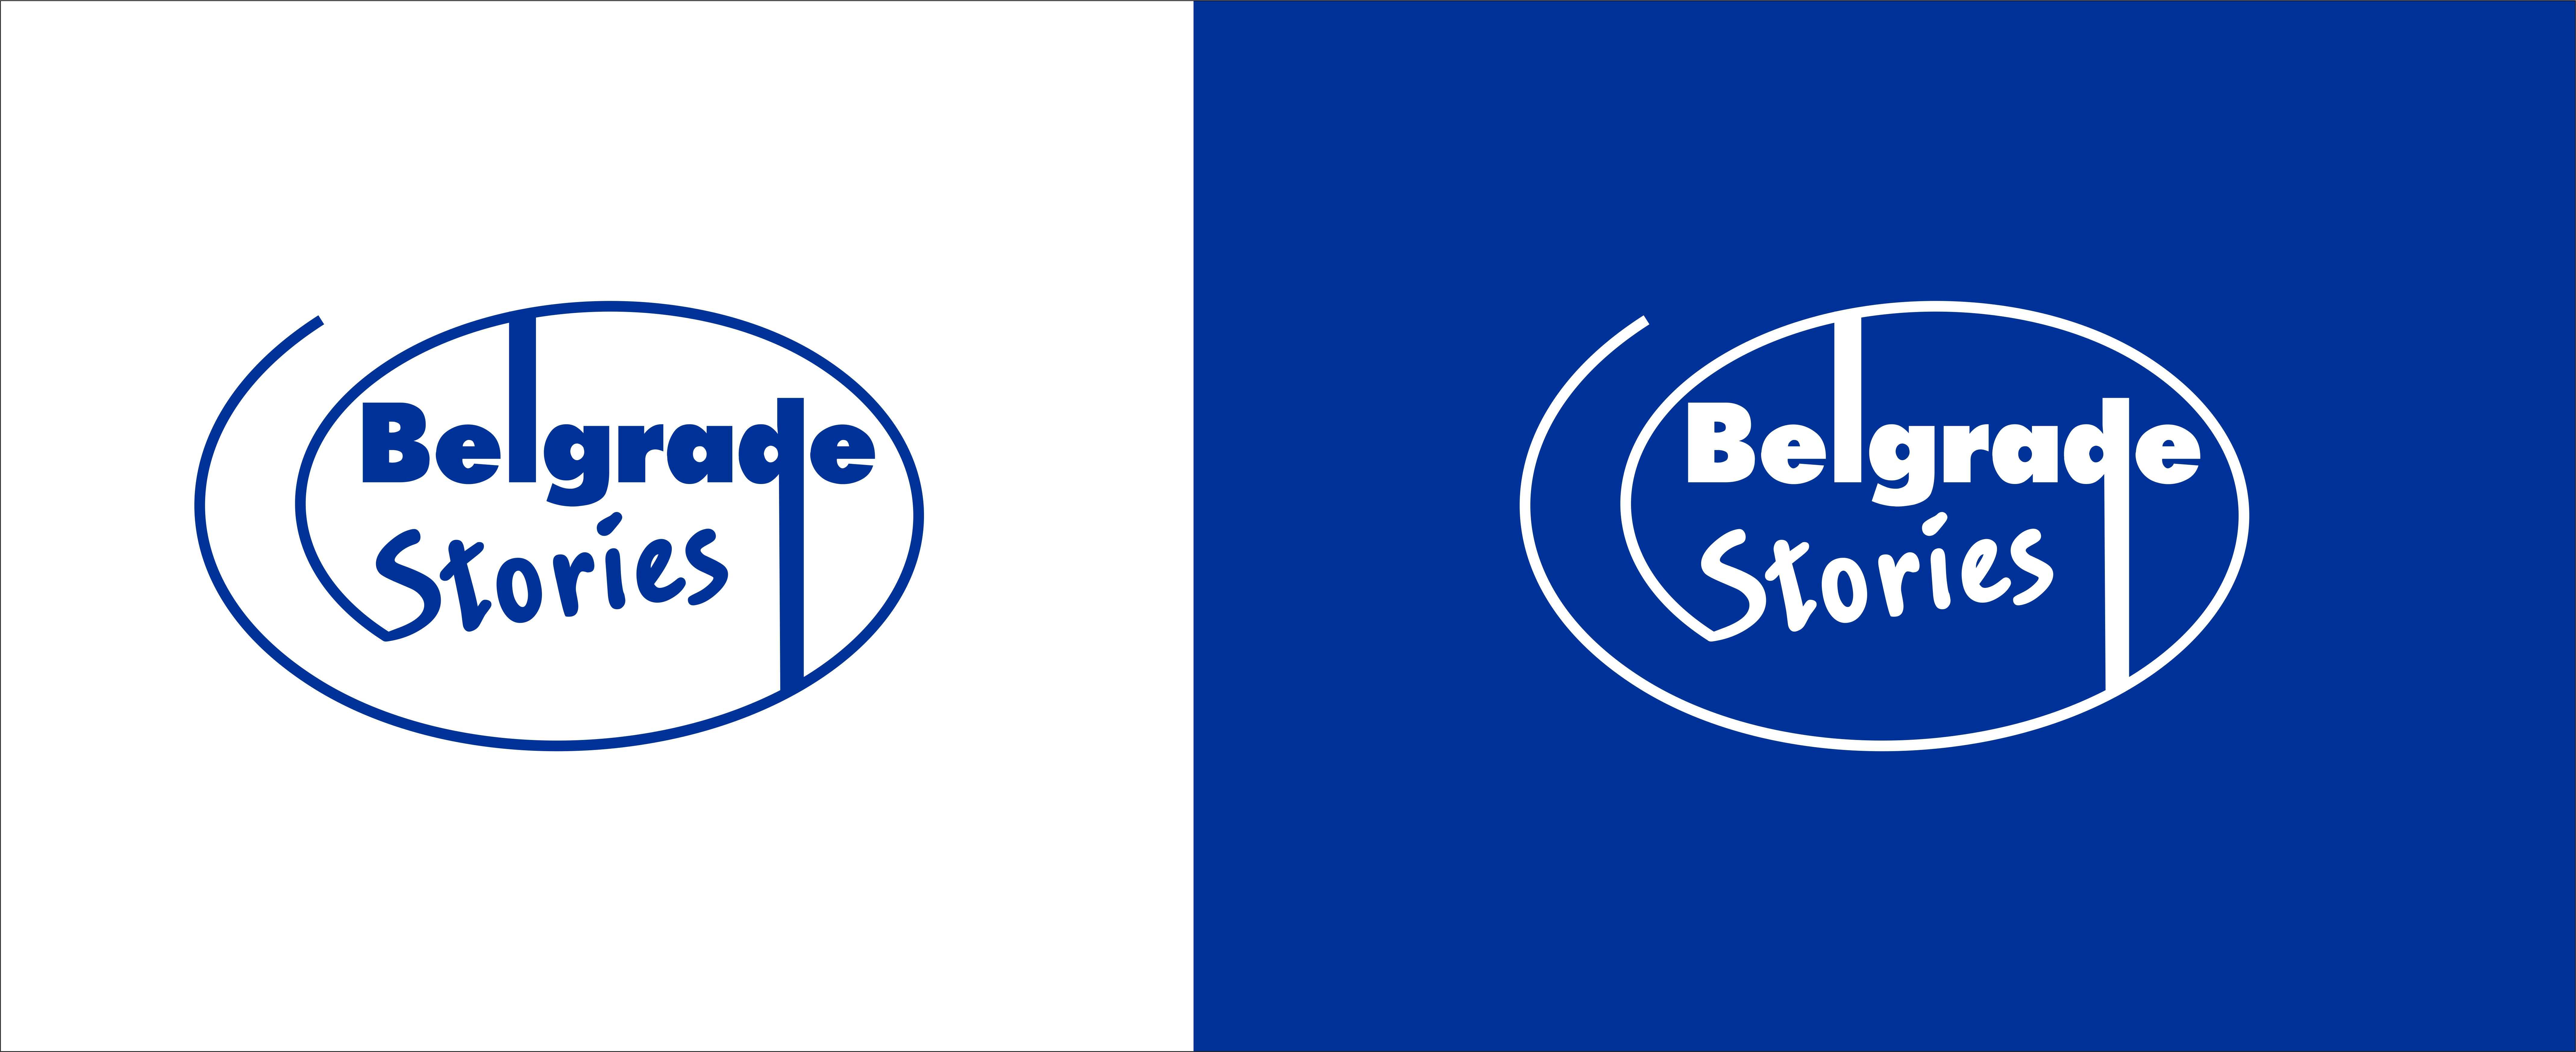 Логотип для агентства городских туров в Белграде фото f_0975898601dba5e8.jpg